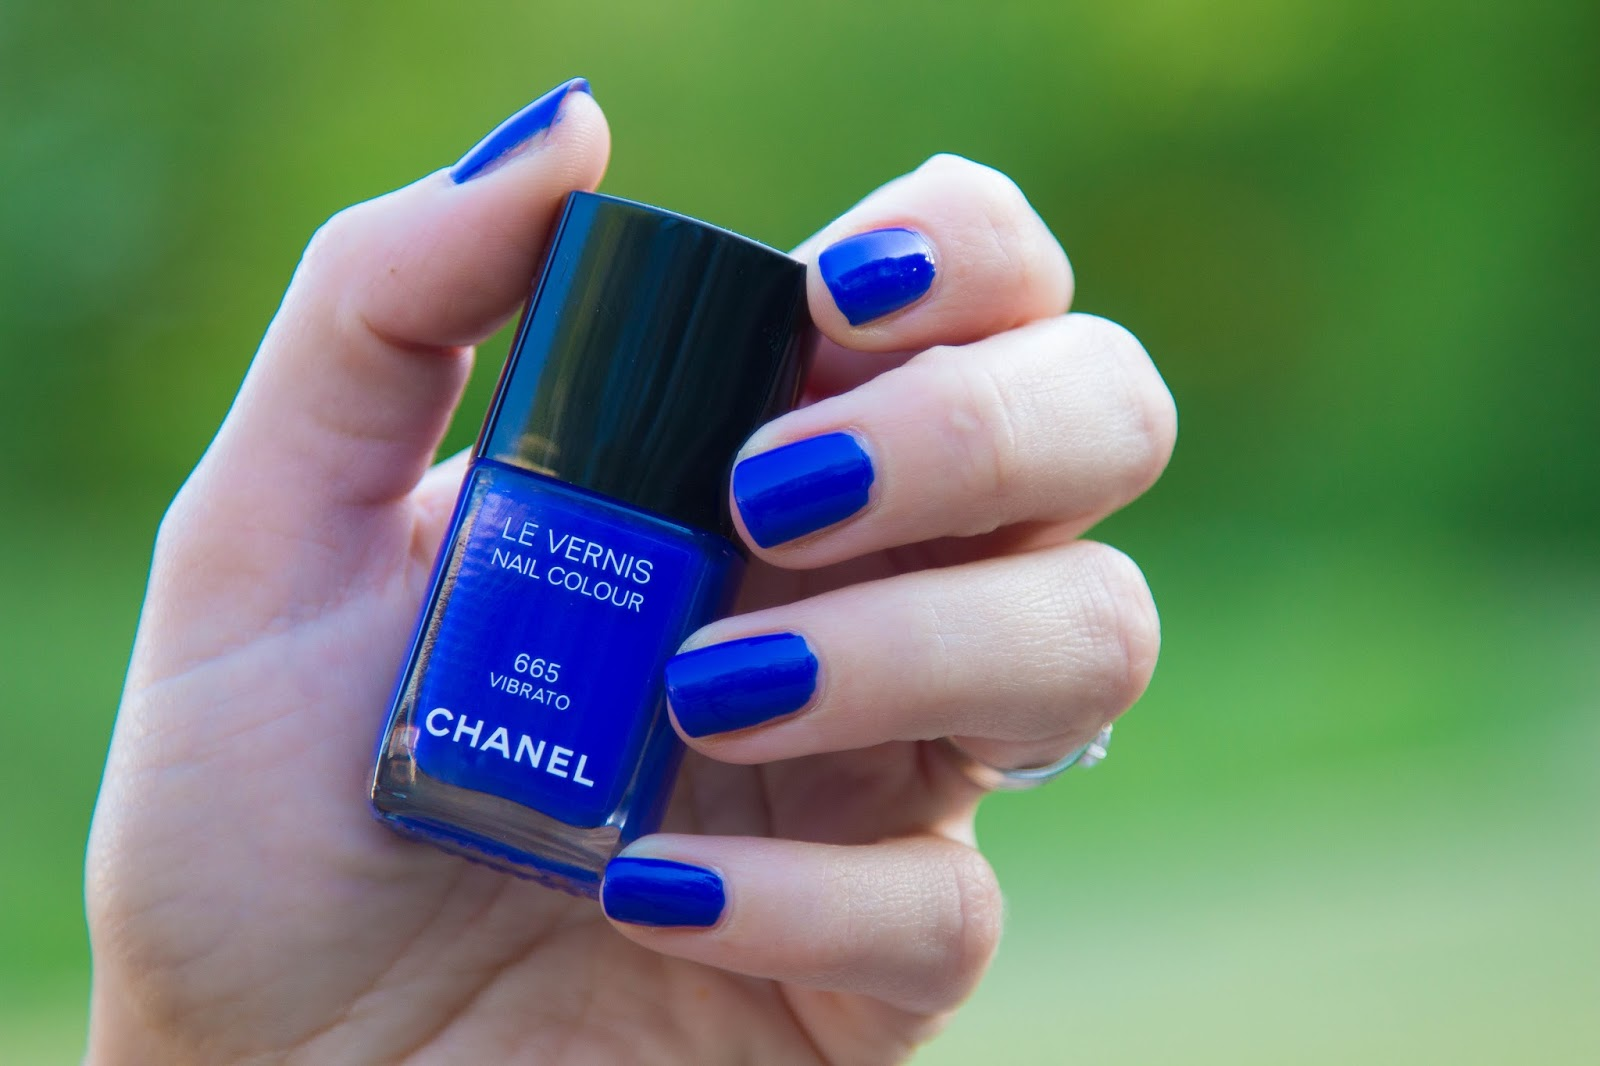 vernis - vibrato - chanel - bleu